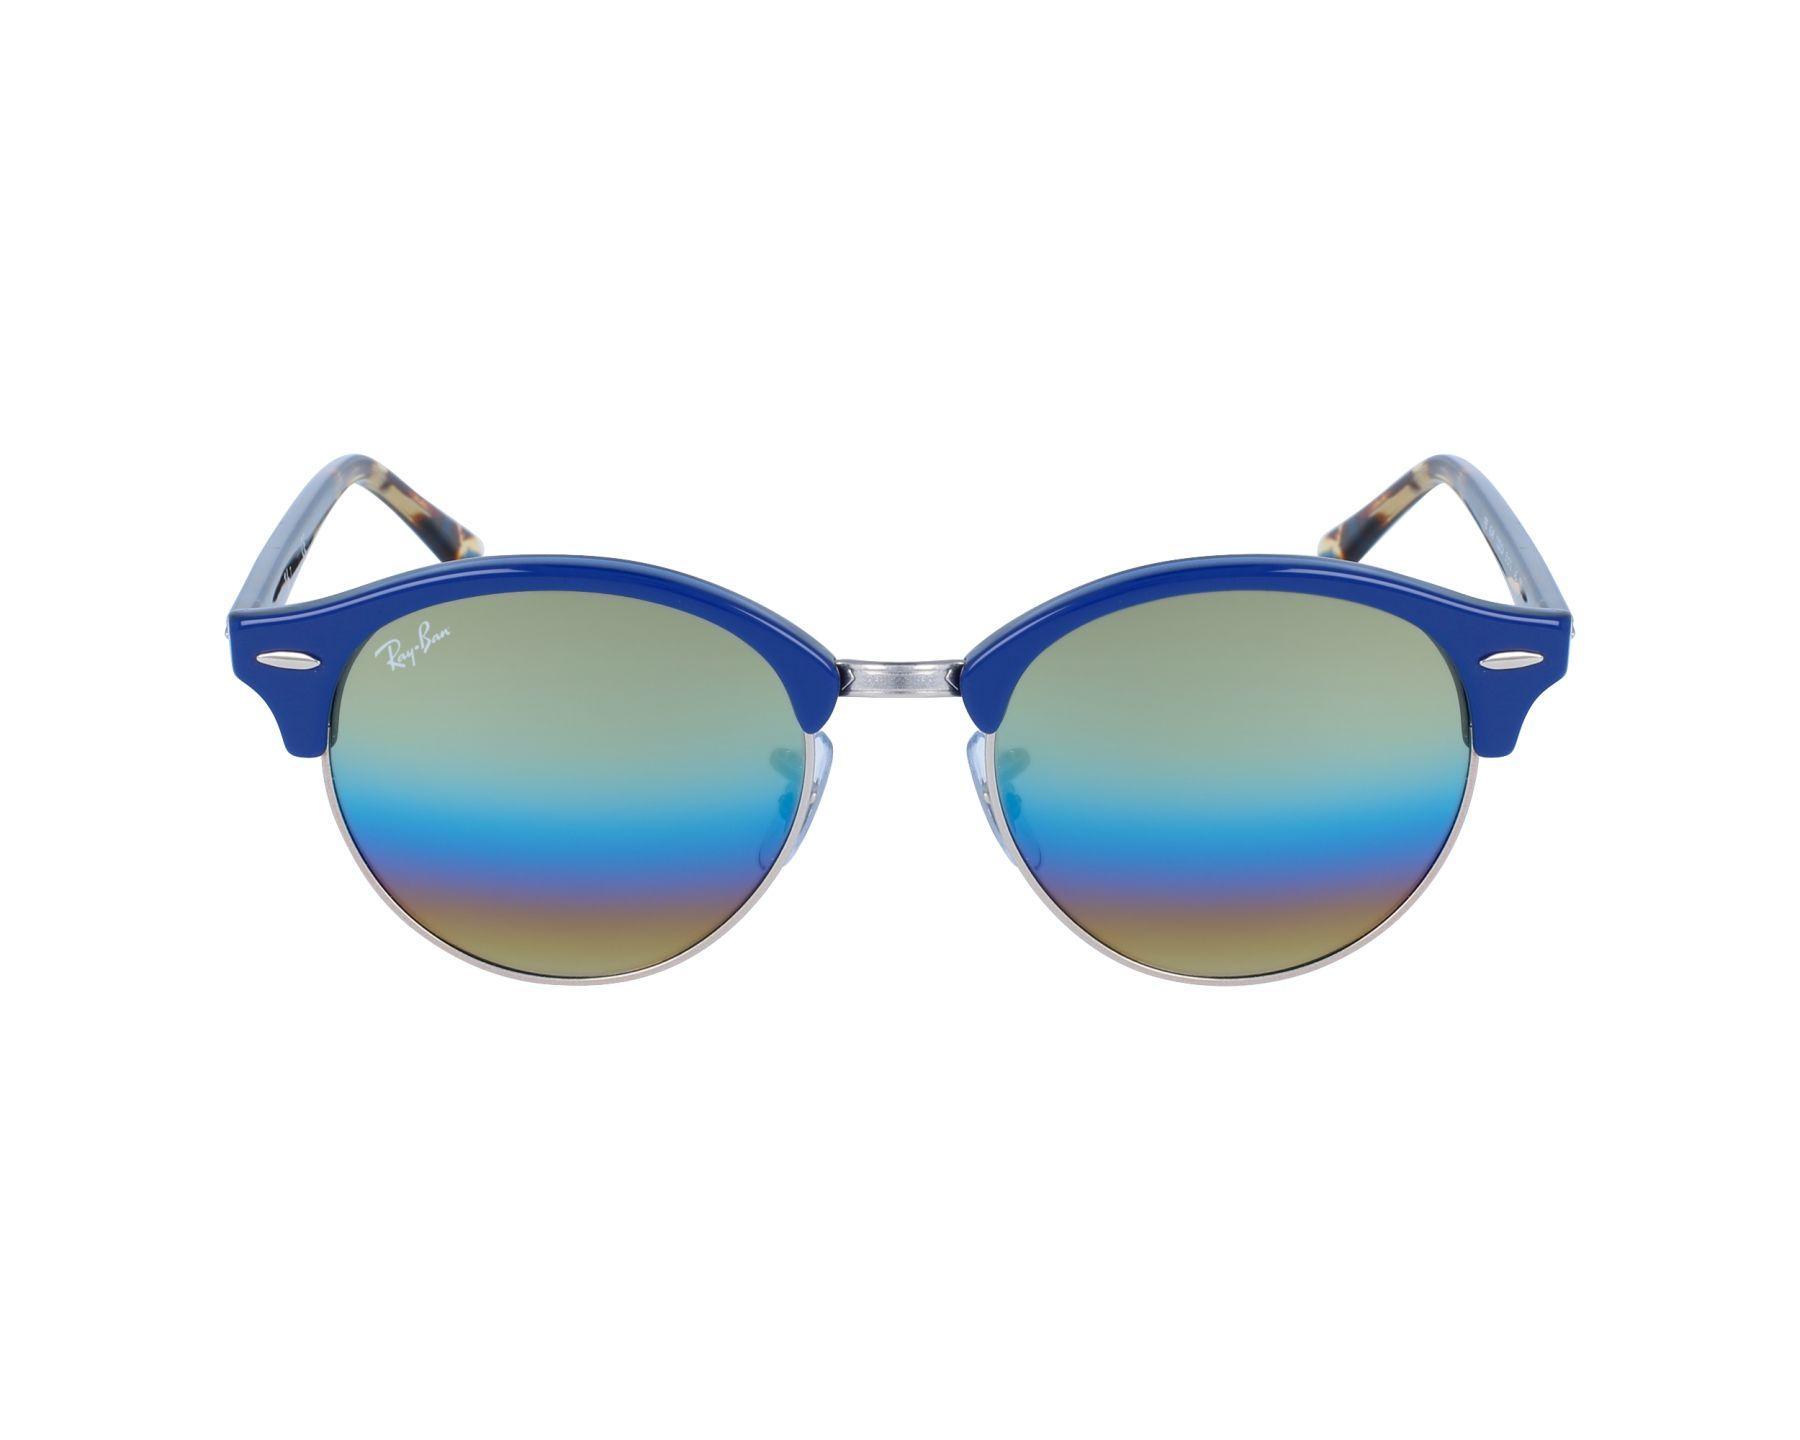 lunettes de soleil ray ban rb 4246 1223 c4 bleu pas cher visionet. Black Bedroom Furniture Sets. Home Design Ideas